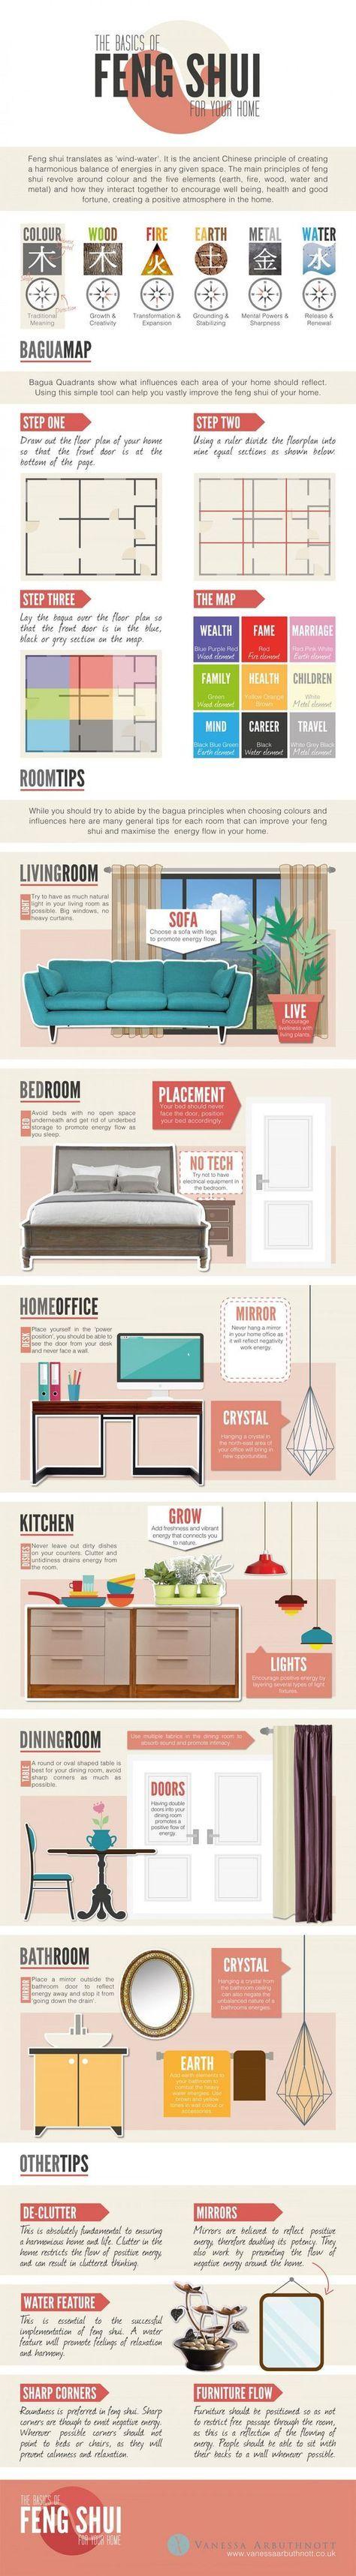 the basics of feng shui for your home infographic feng shui pinterest. Black Bedroom Furniture Sets. Home Design Ideas